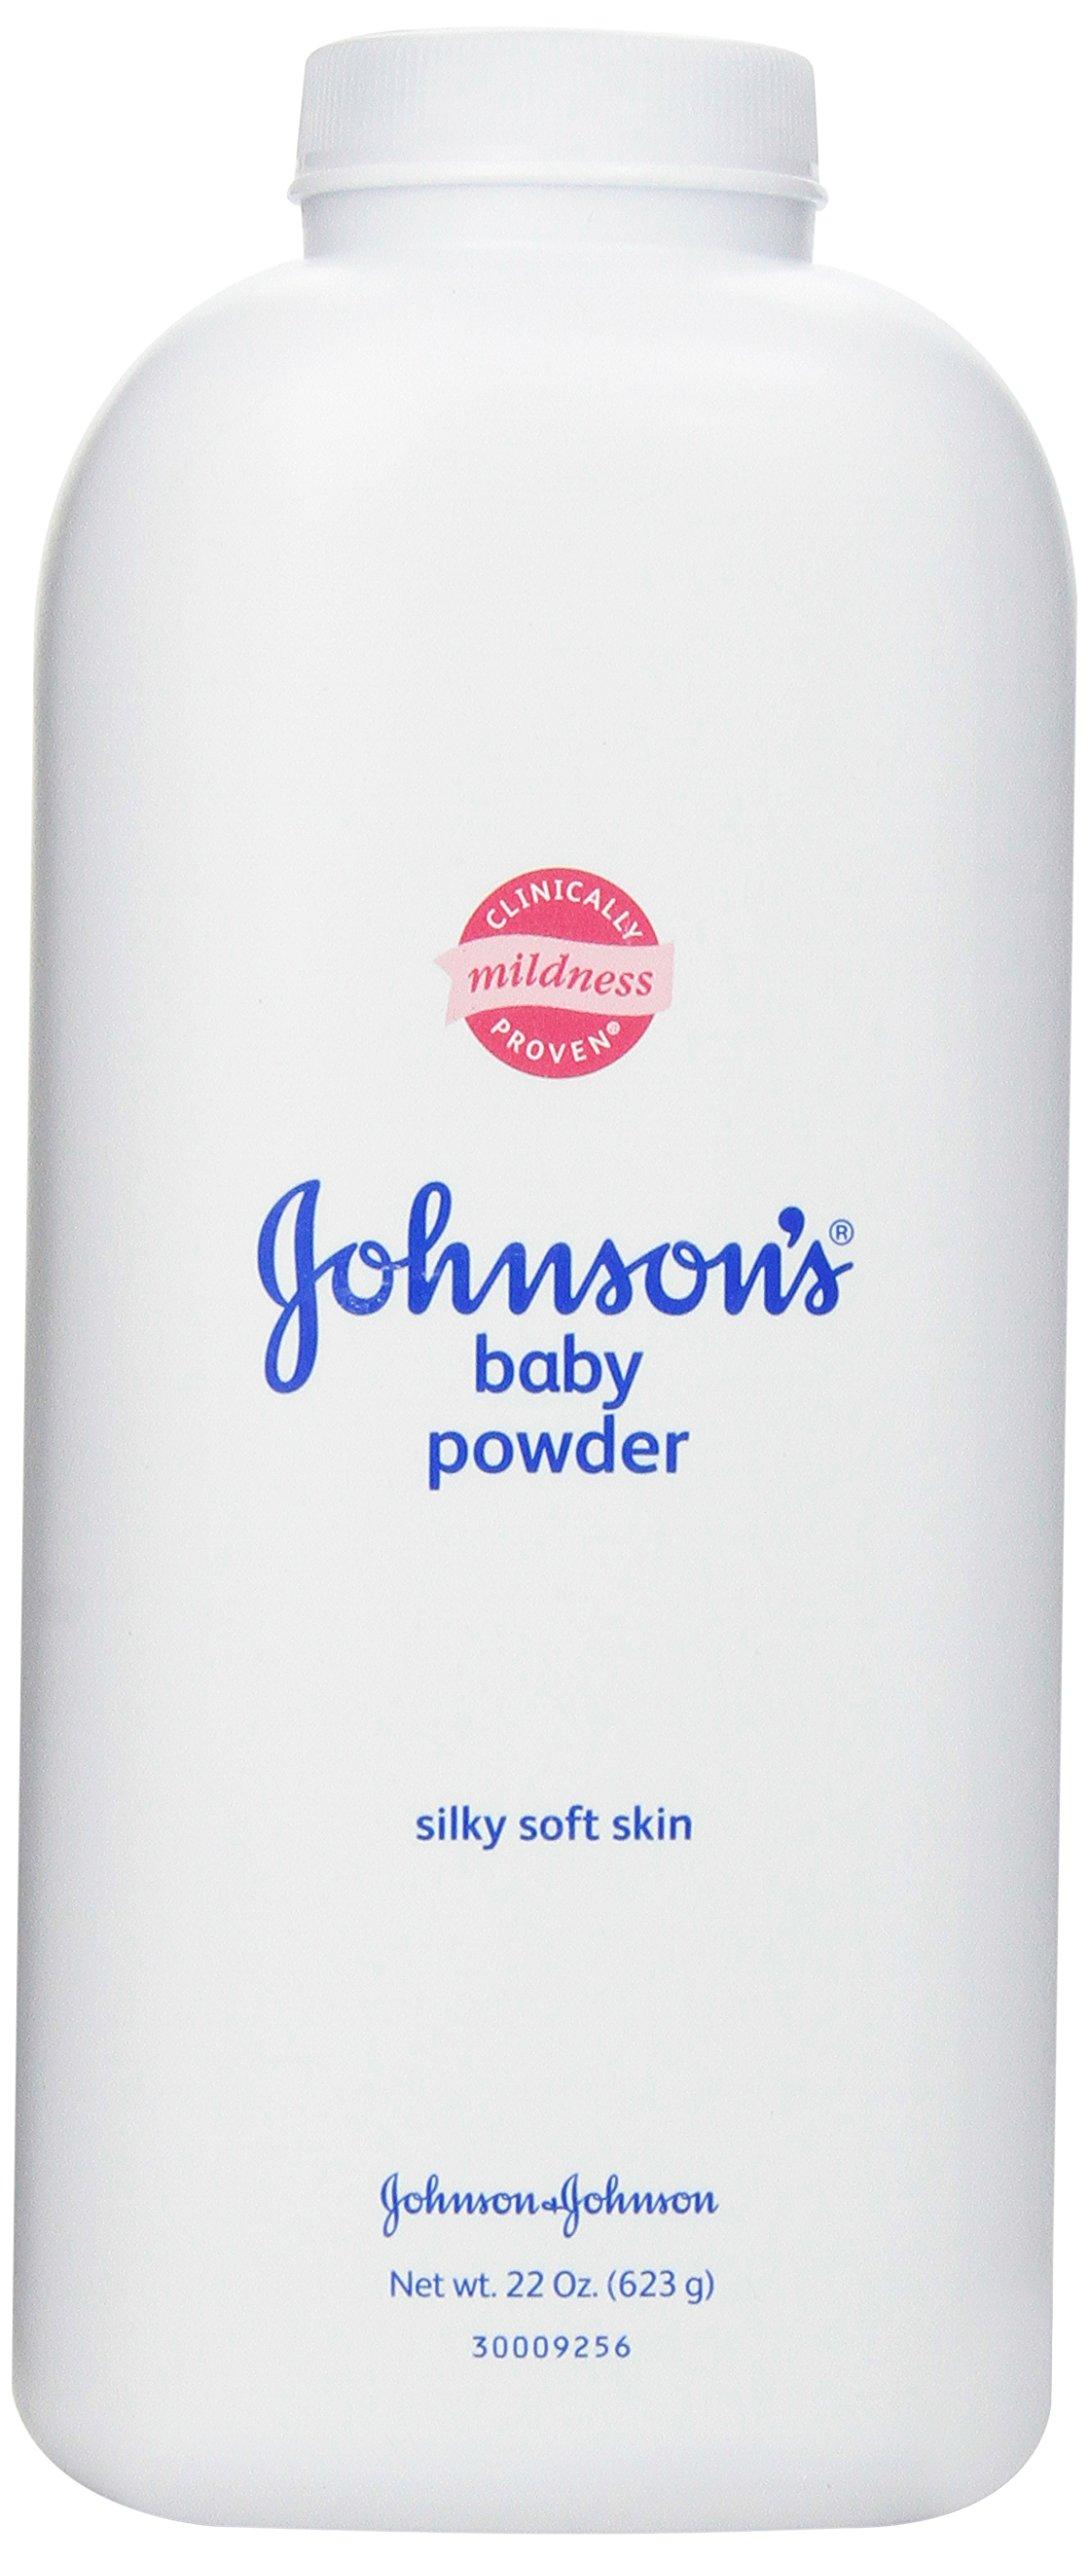 Johnson's Baby Powder, Silky Soft Skin, 22 Ounce